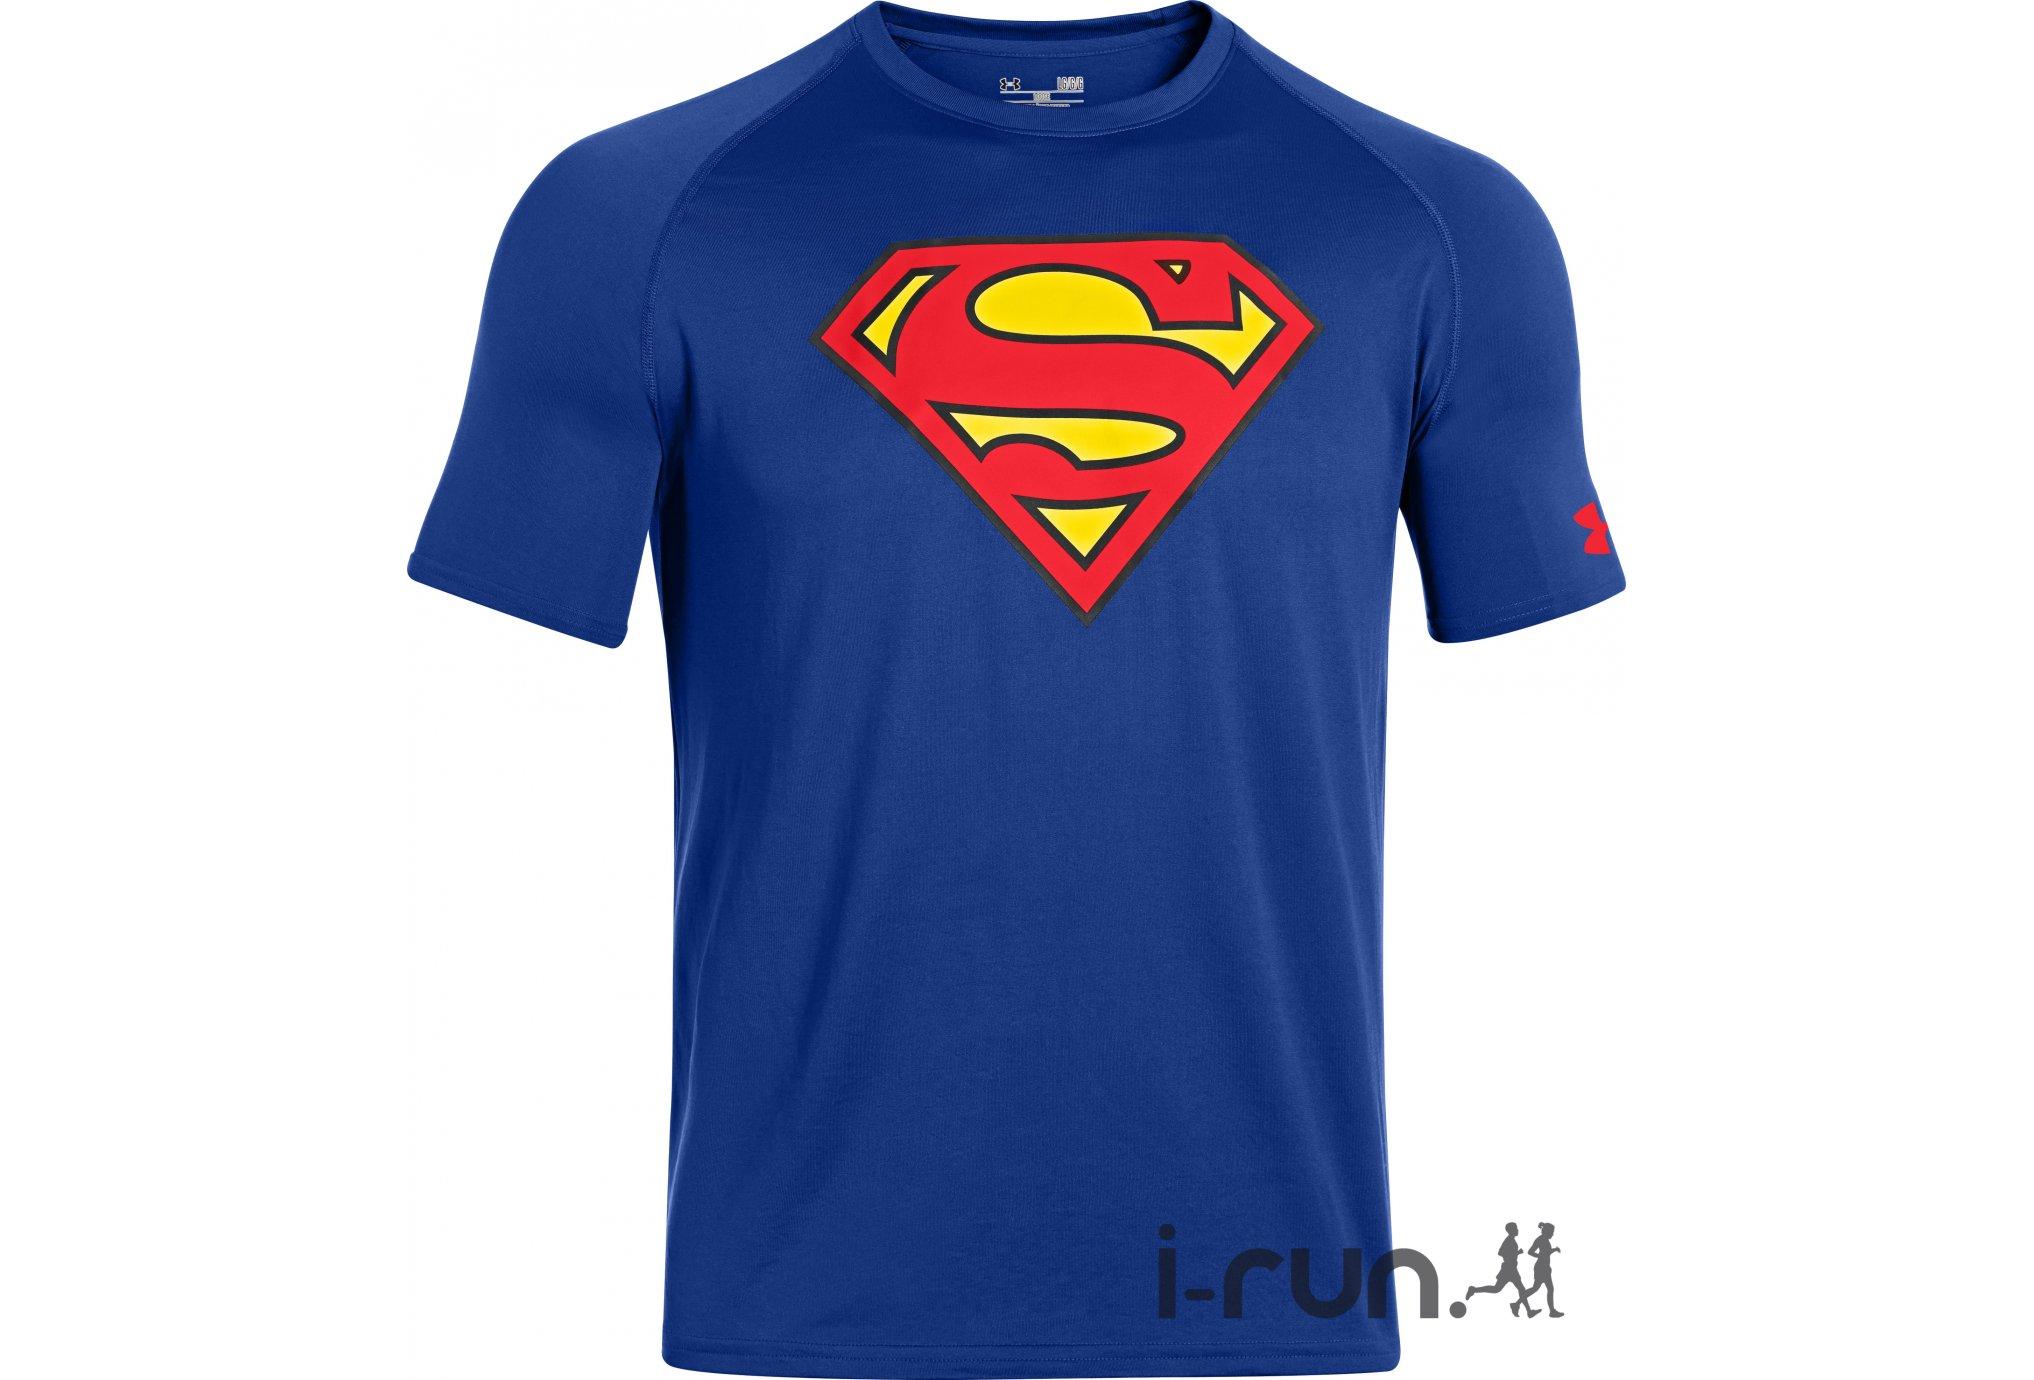 Under Armour Tee-Shirt Transform Yourself Superman Core M vêtement running homme